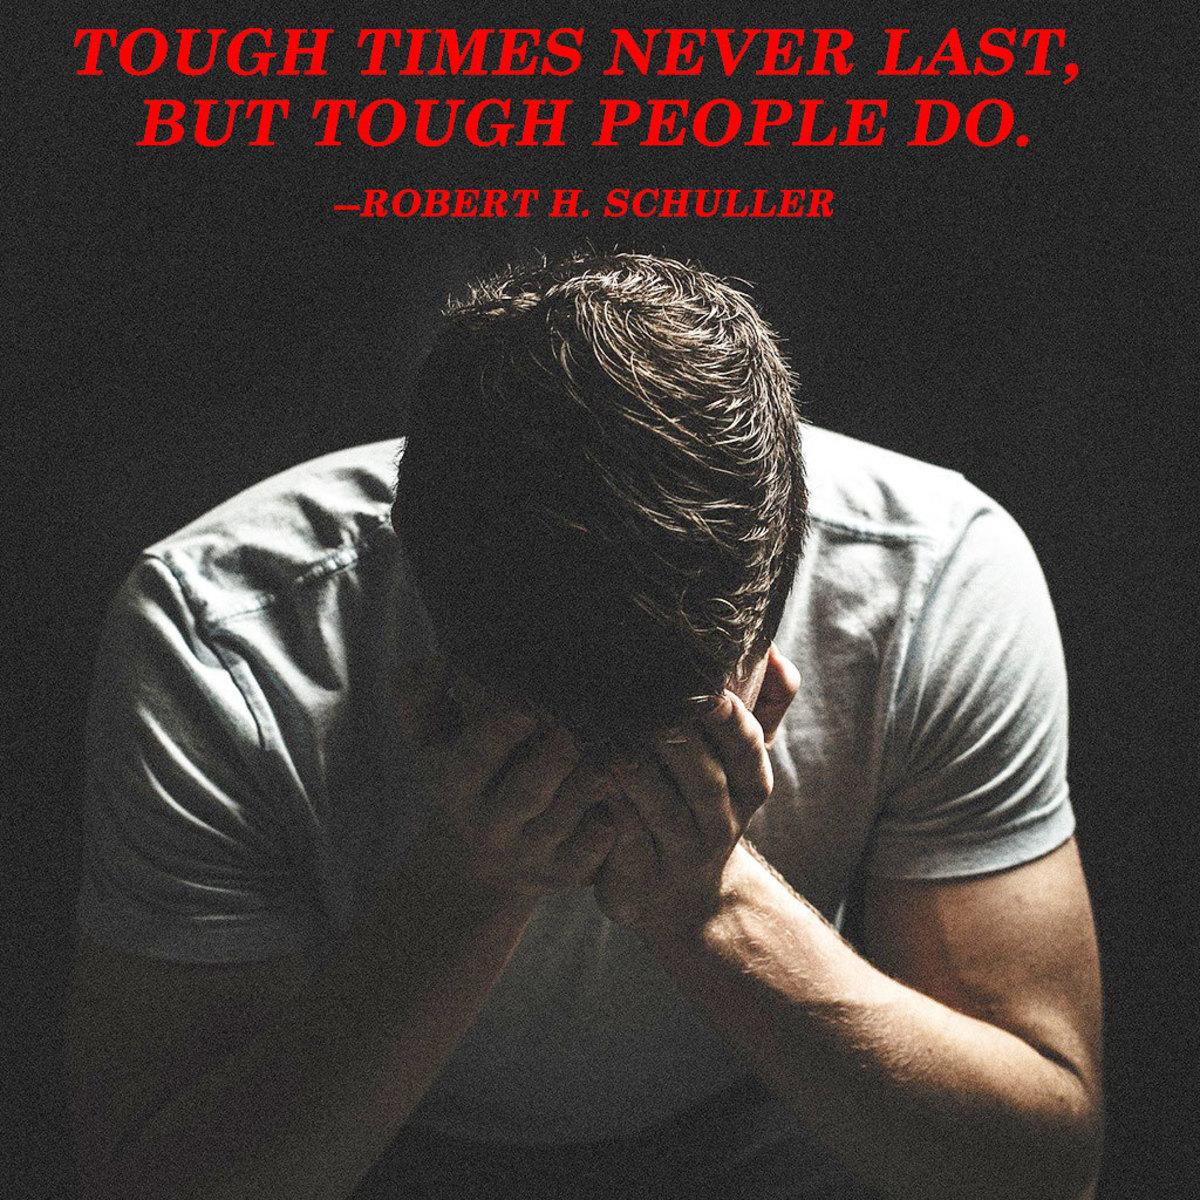 """Tough times never last, but tough people do."" --Robert H. Schuller"